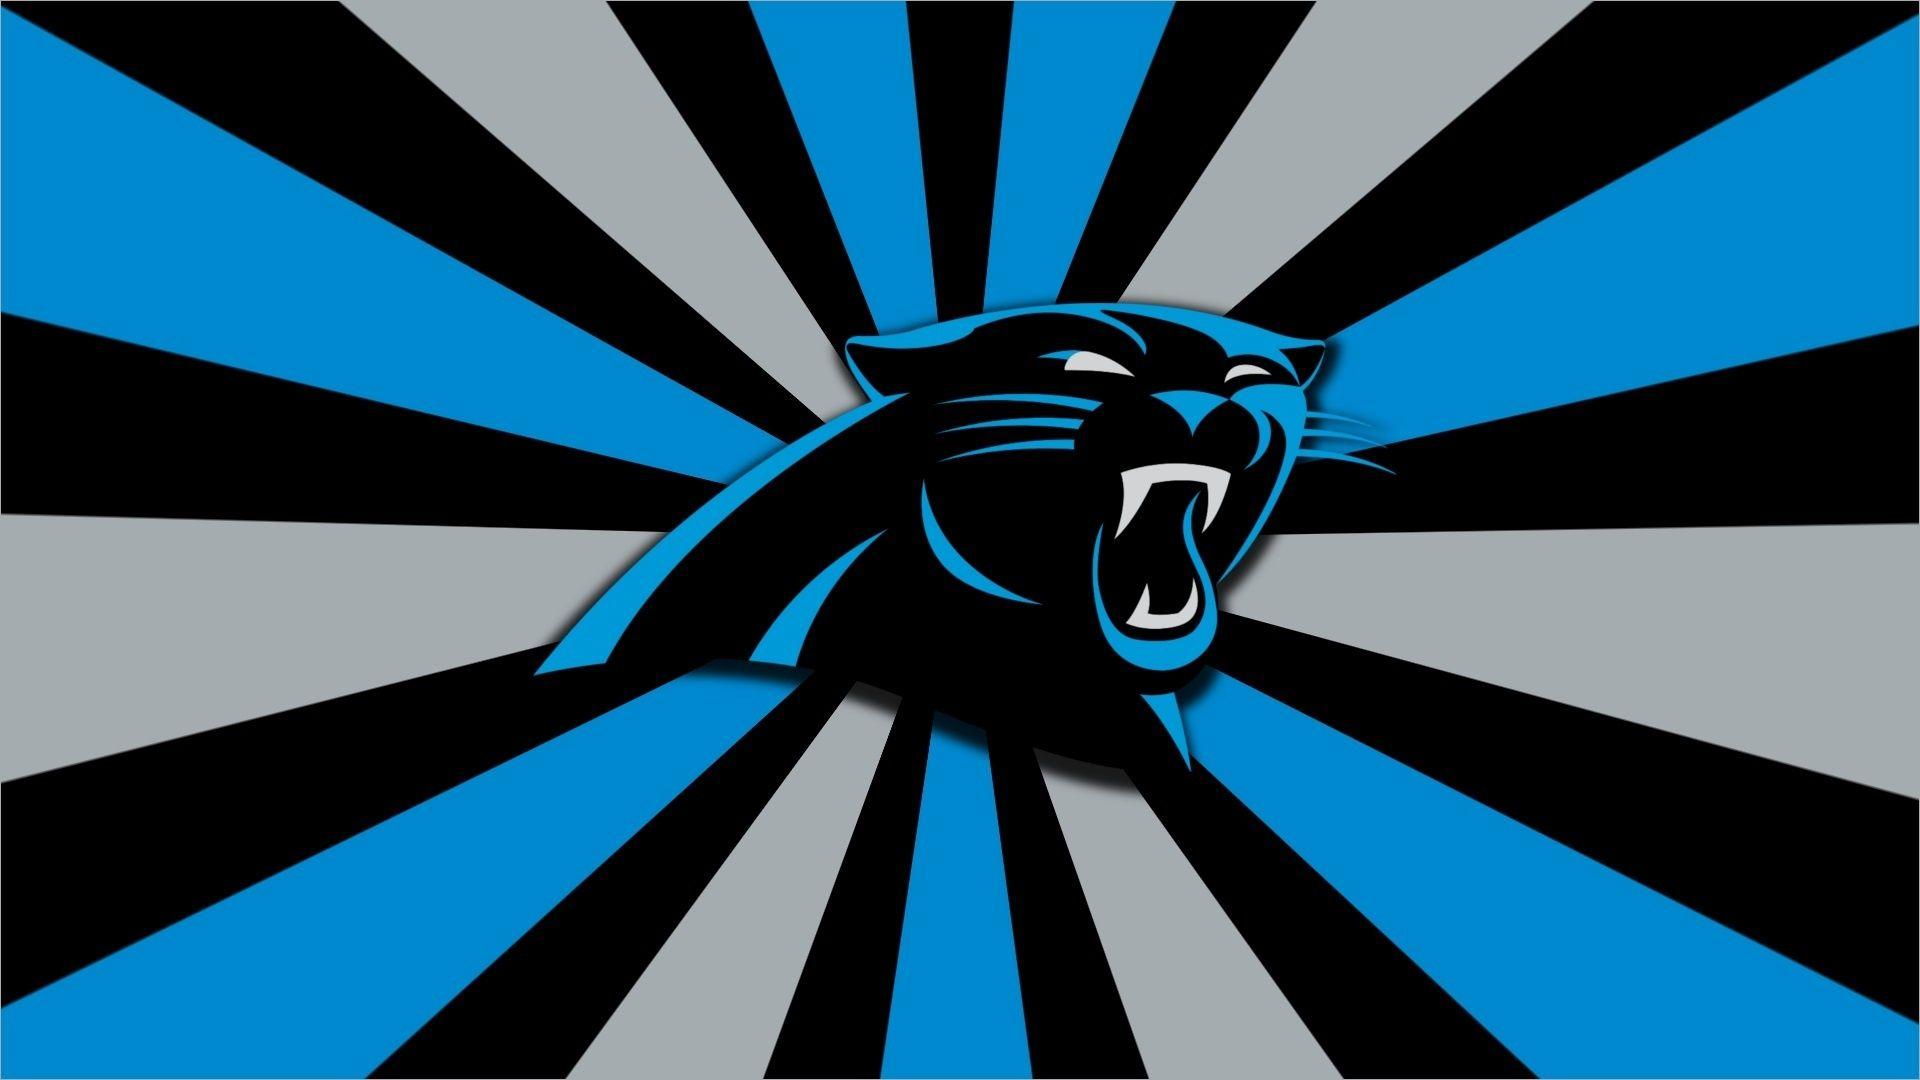 Carolina Panthers Logo Pictures 1001 Health Care Logos Carolina Panthers Wallpaper Carolina Panthers Logo Wallpapers Carolina Panthers Logo